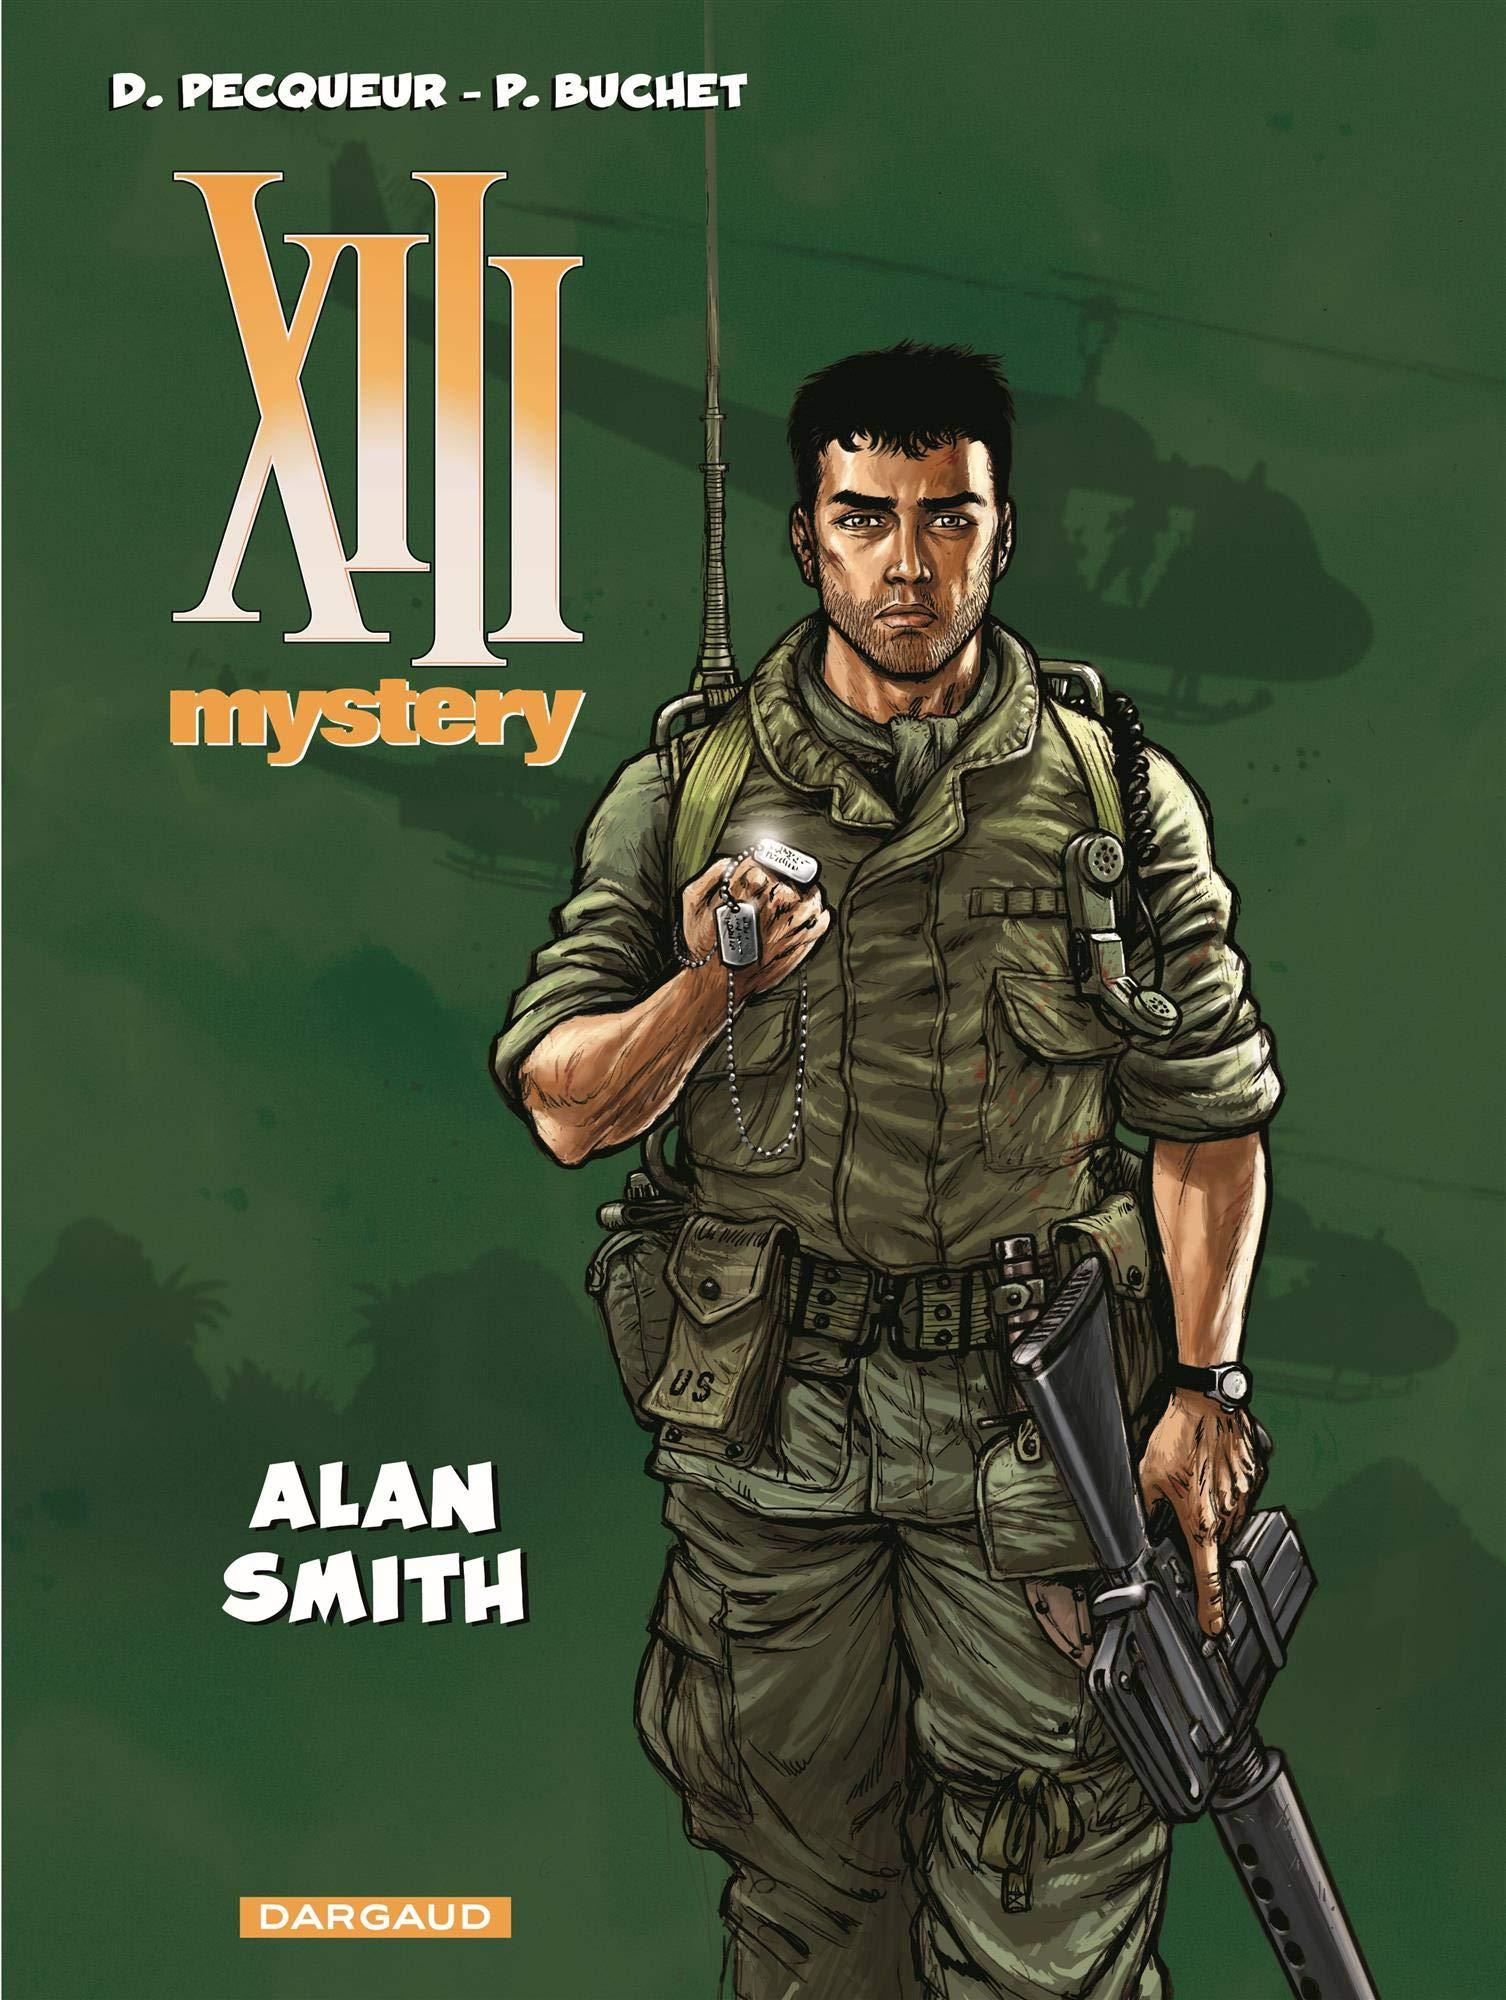 XIII Mystery - tome 12 - Alan Smith Album – 8 juin 2018 Pecqueur Philippe Buchet Dargaud 2505069425